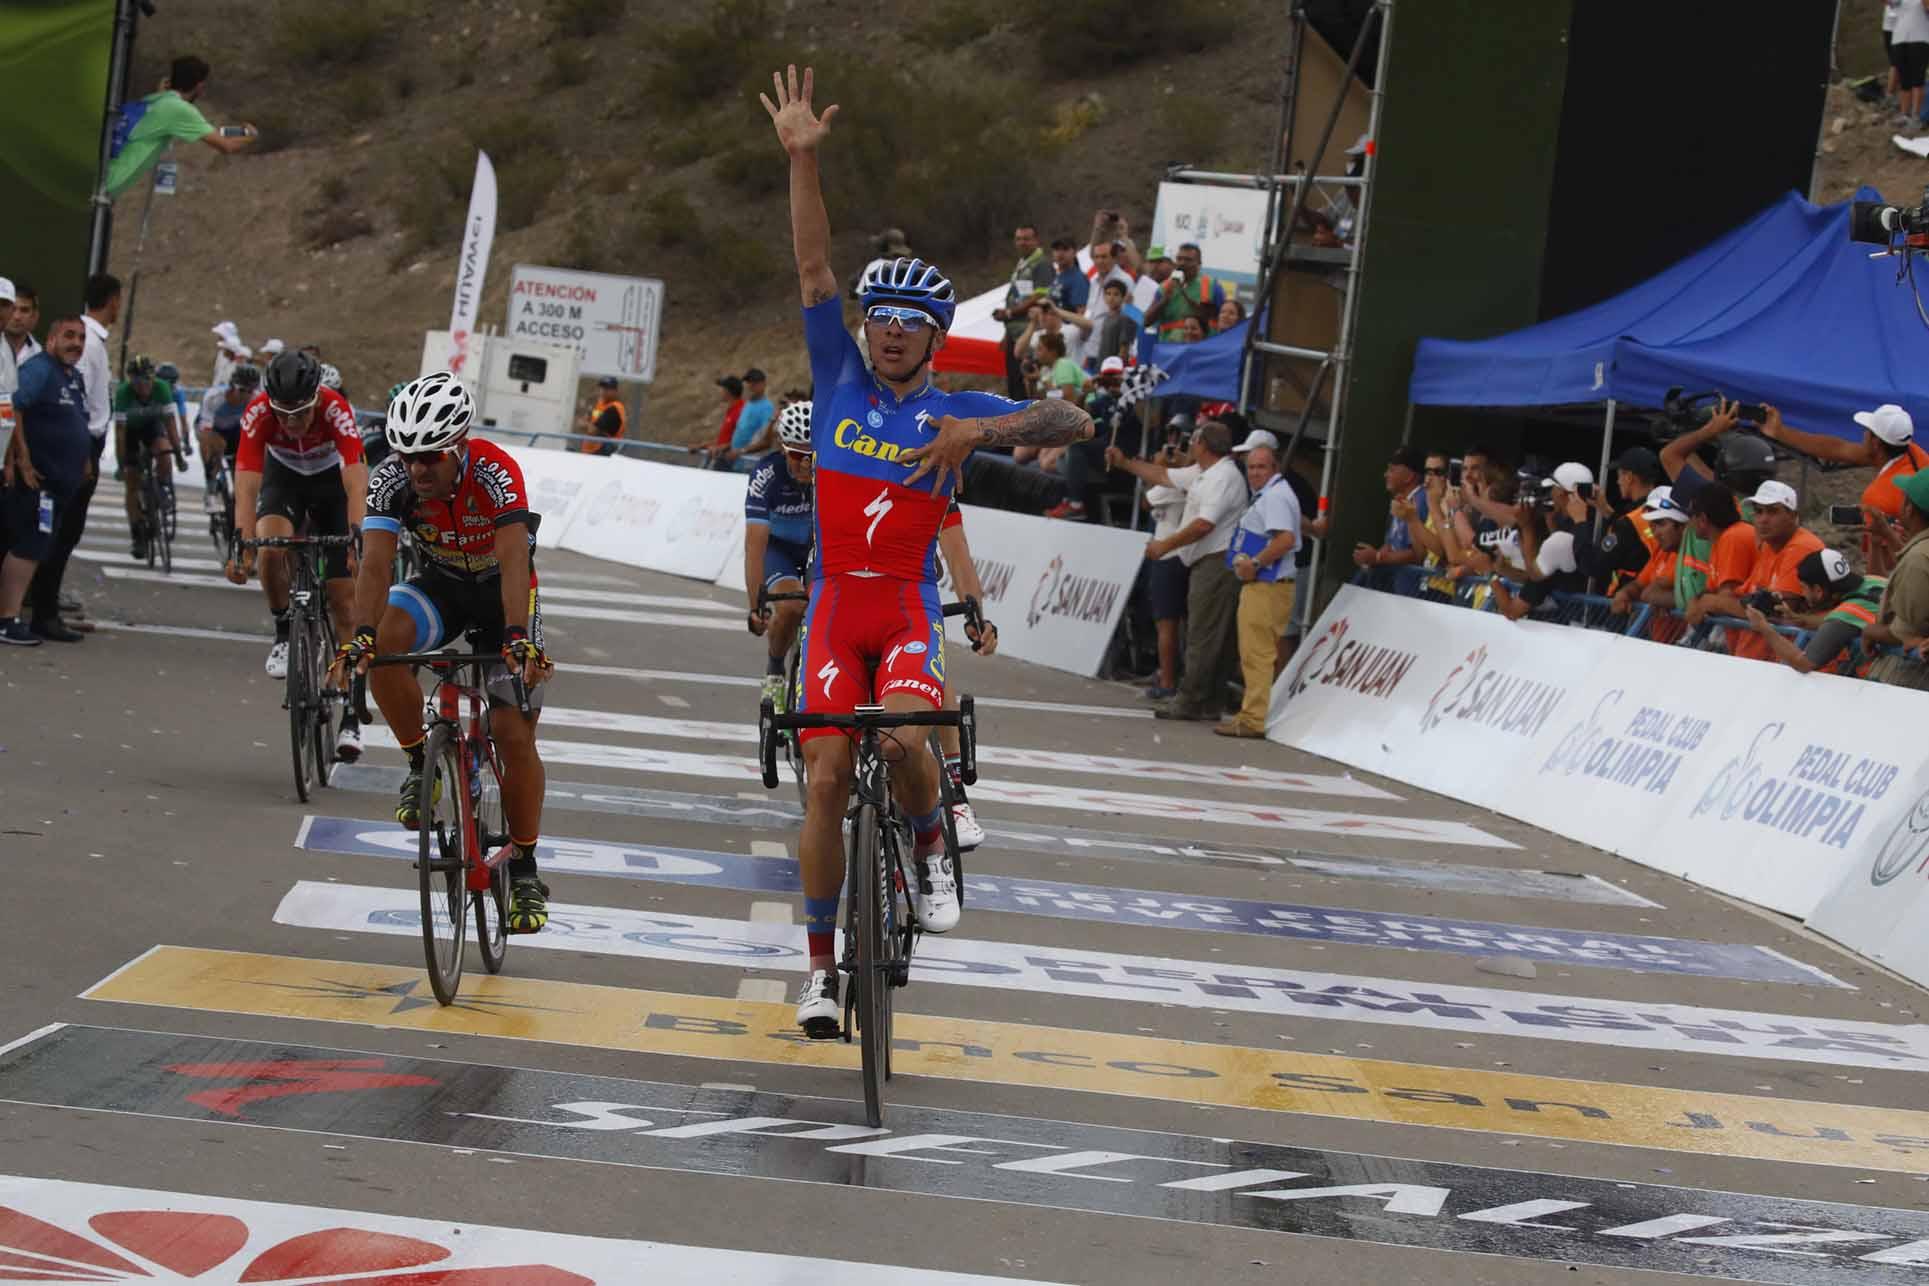 Roman Villalobos vince la seconda tappa della Vuelta a San Juan 2018